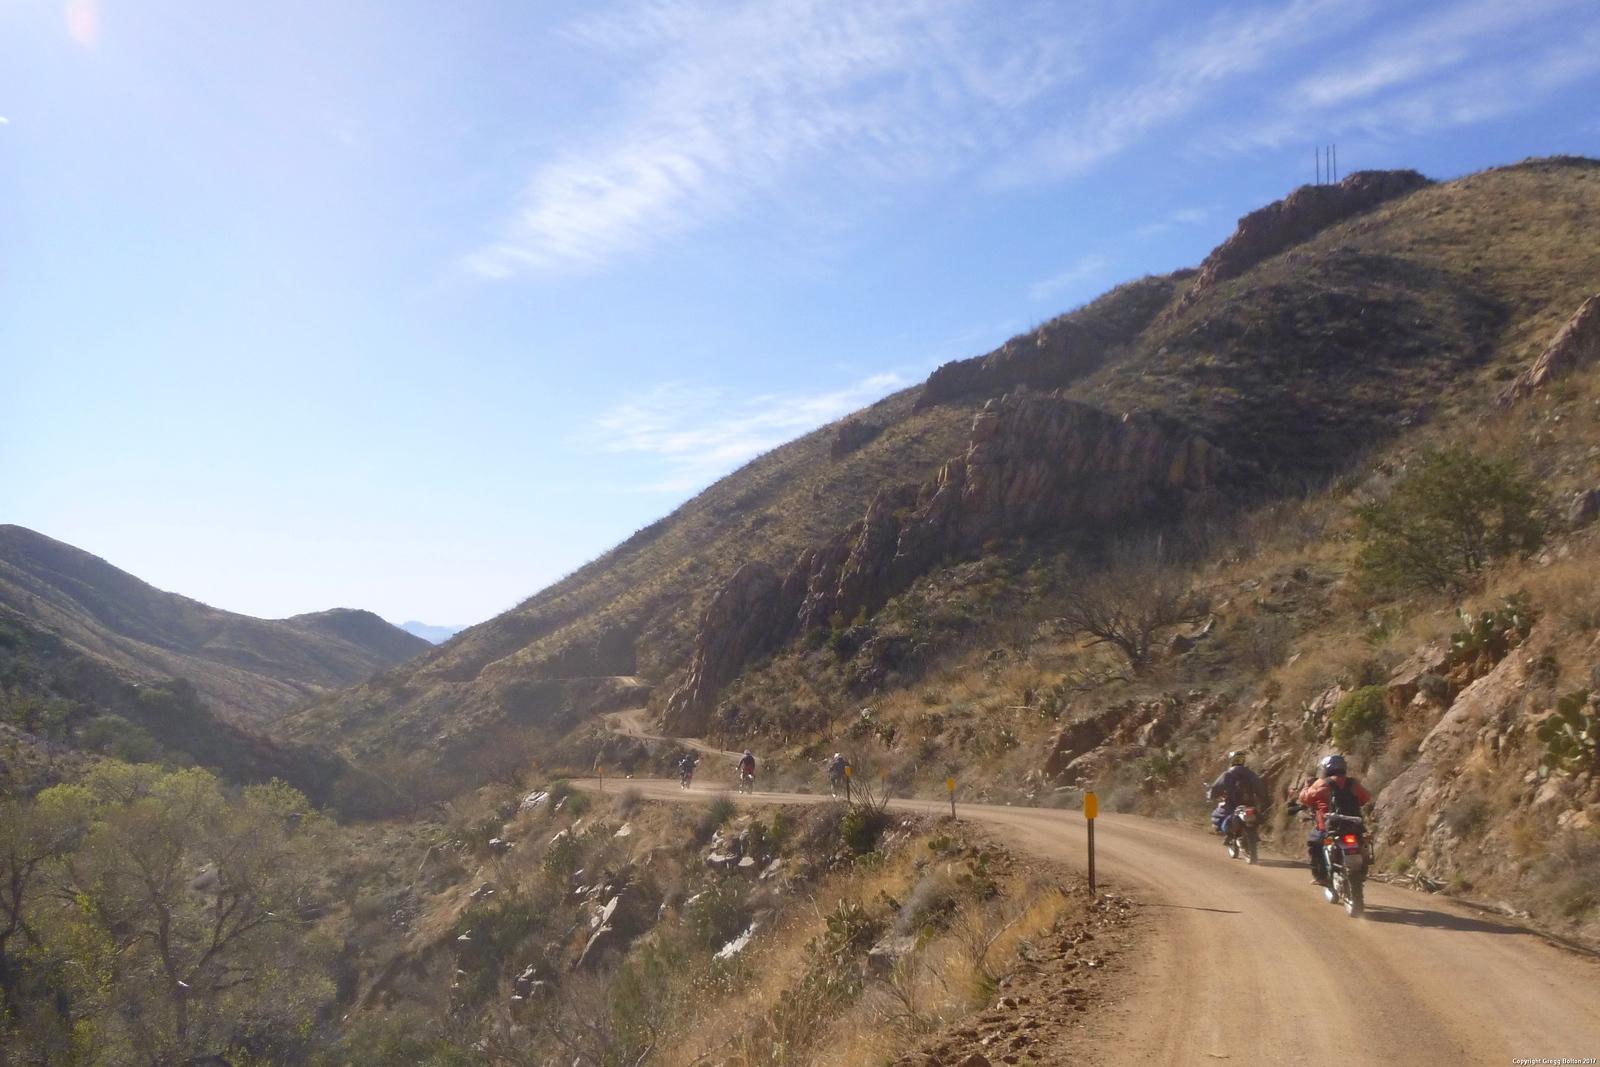 On Box Canyon Road